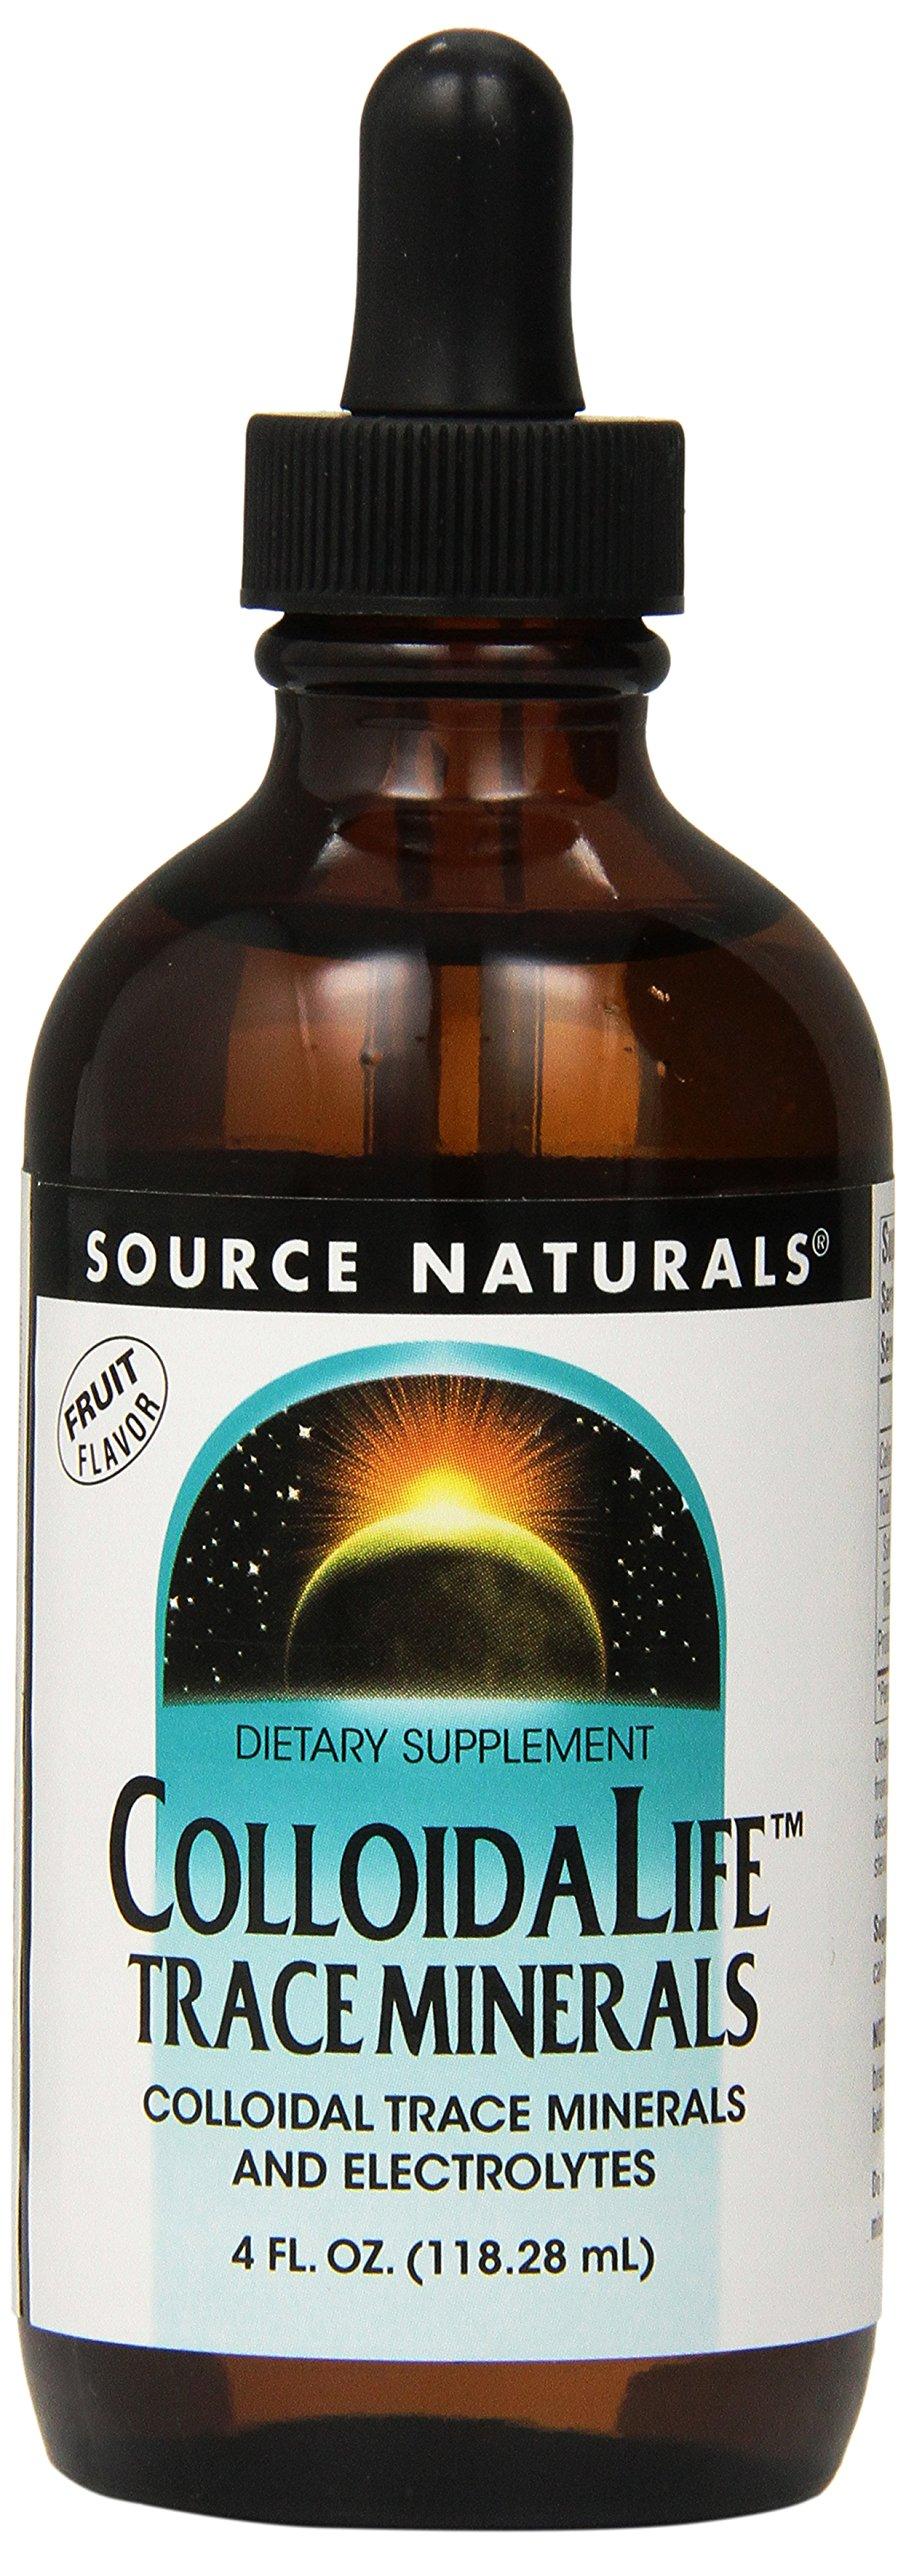 SOURCE NATURALS Colloidalife Trace Minerals Fruit, 4 Fluid Ounce